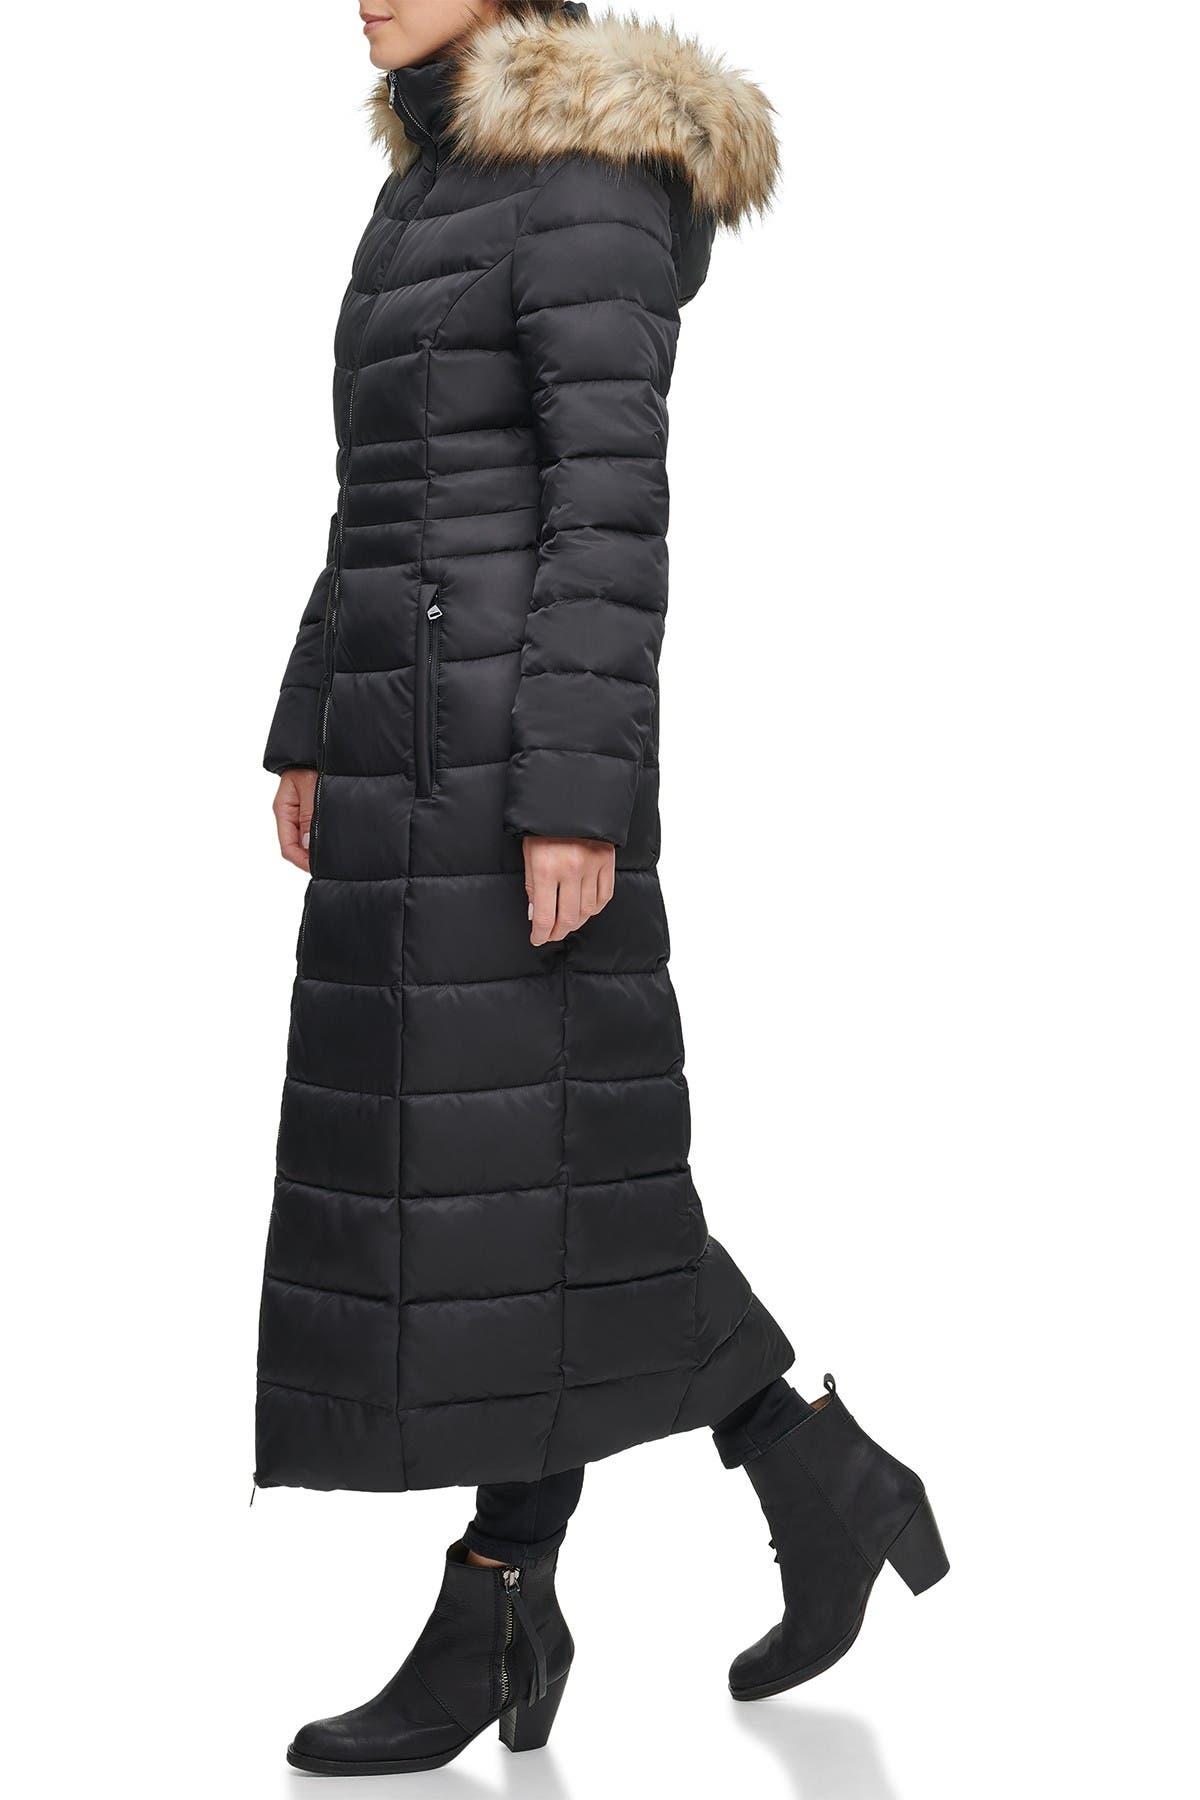 KENNETH COLE Faux Fur Hood Zip Front Puffer Jacket